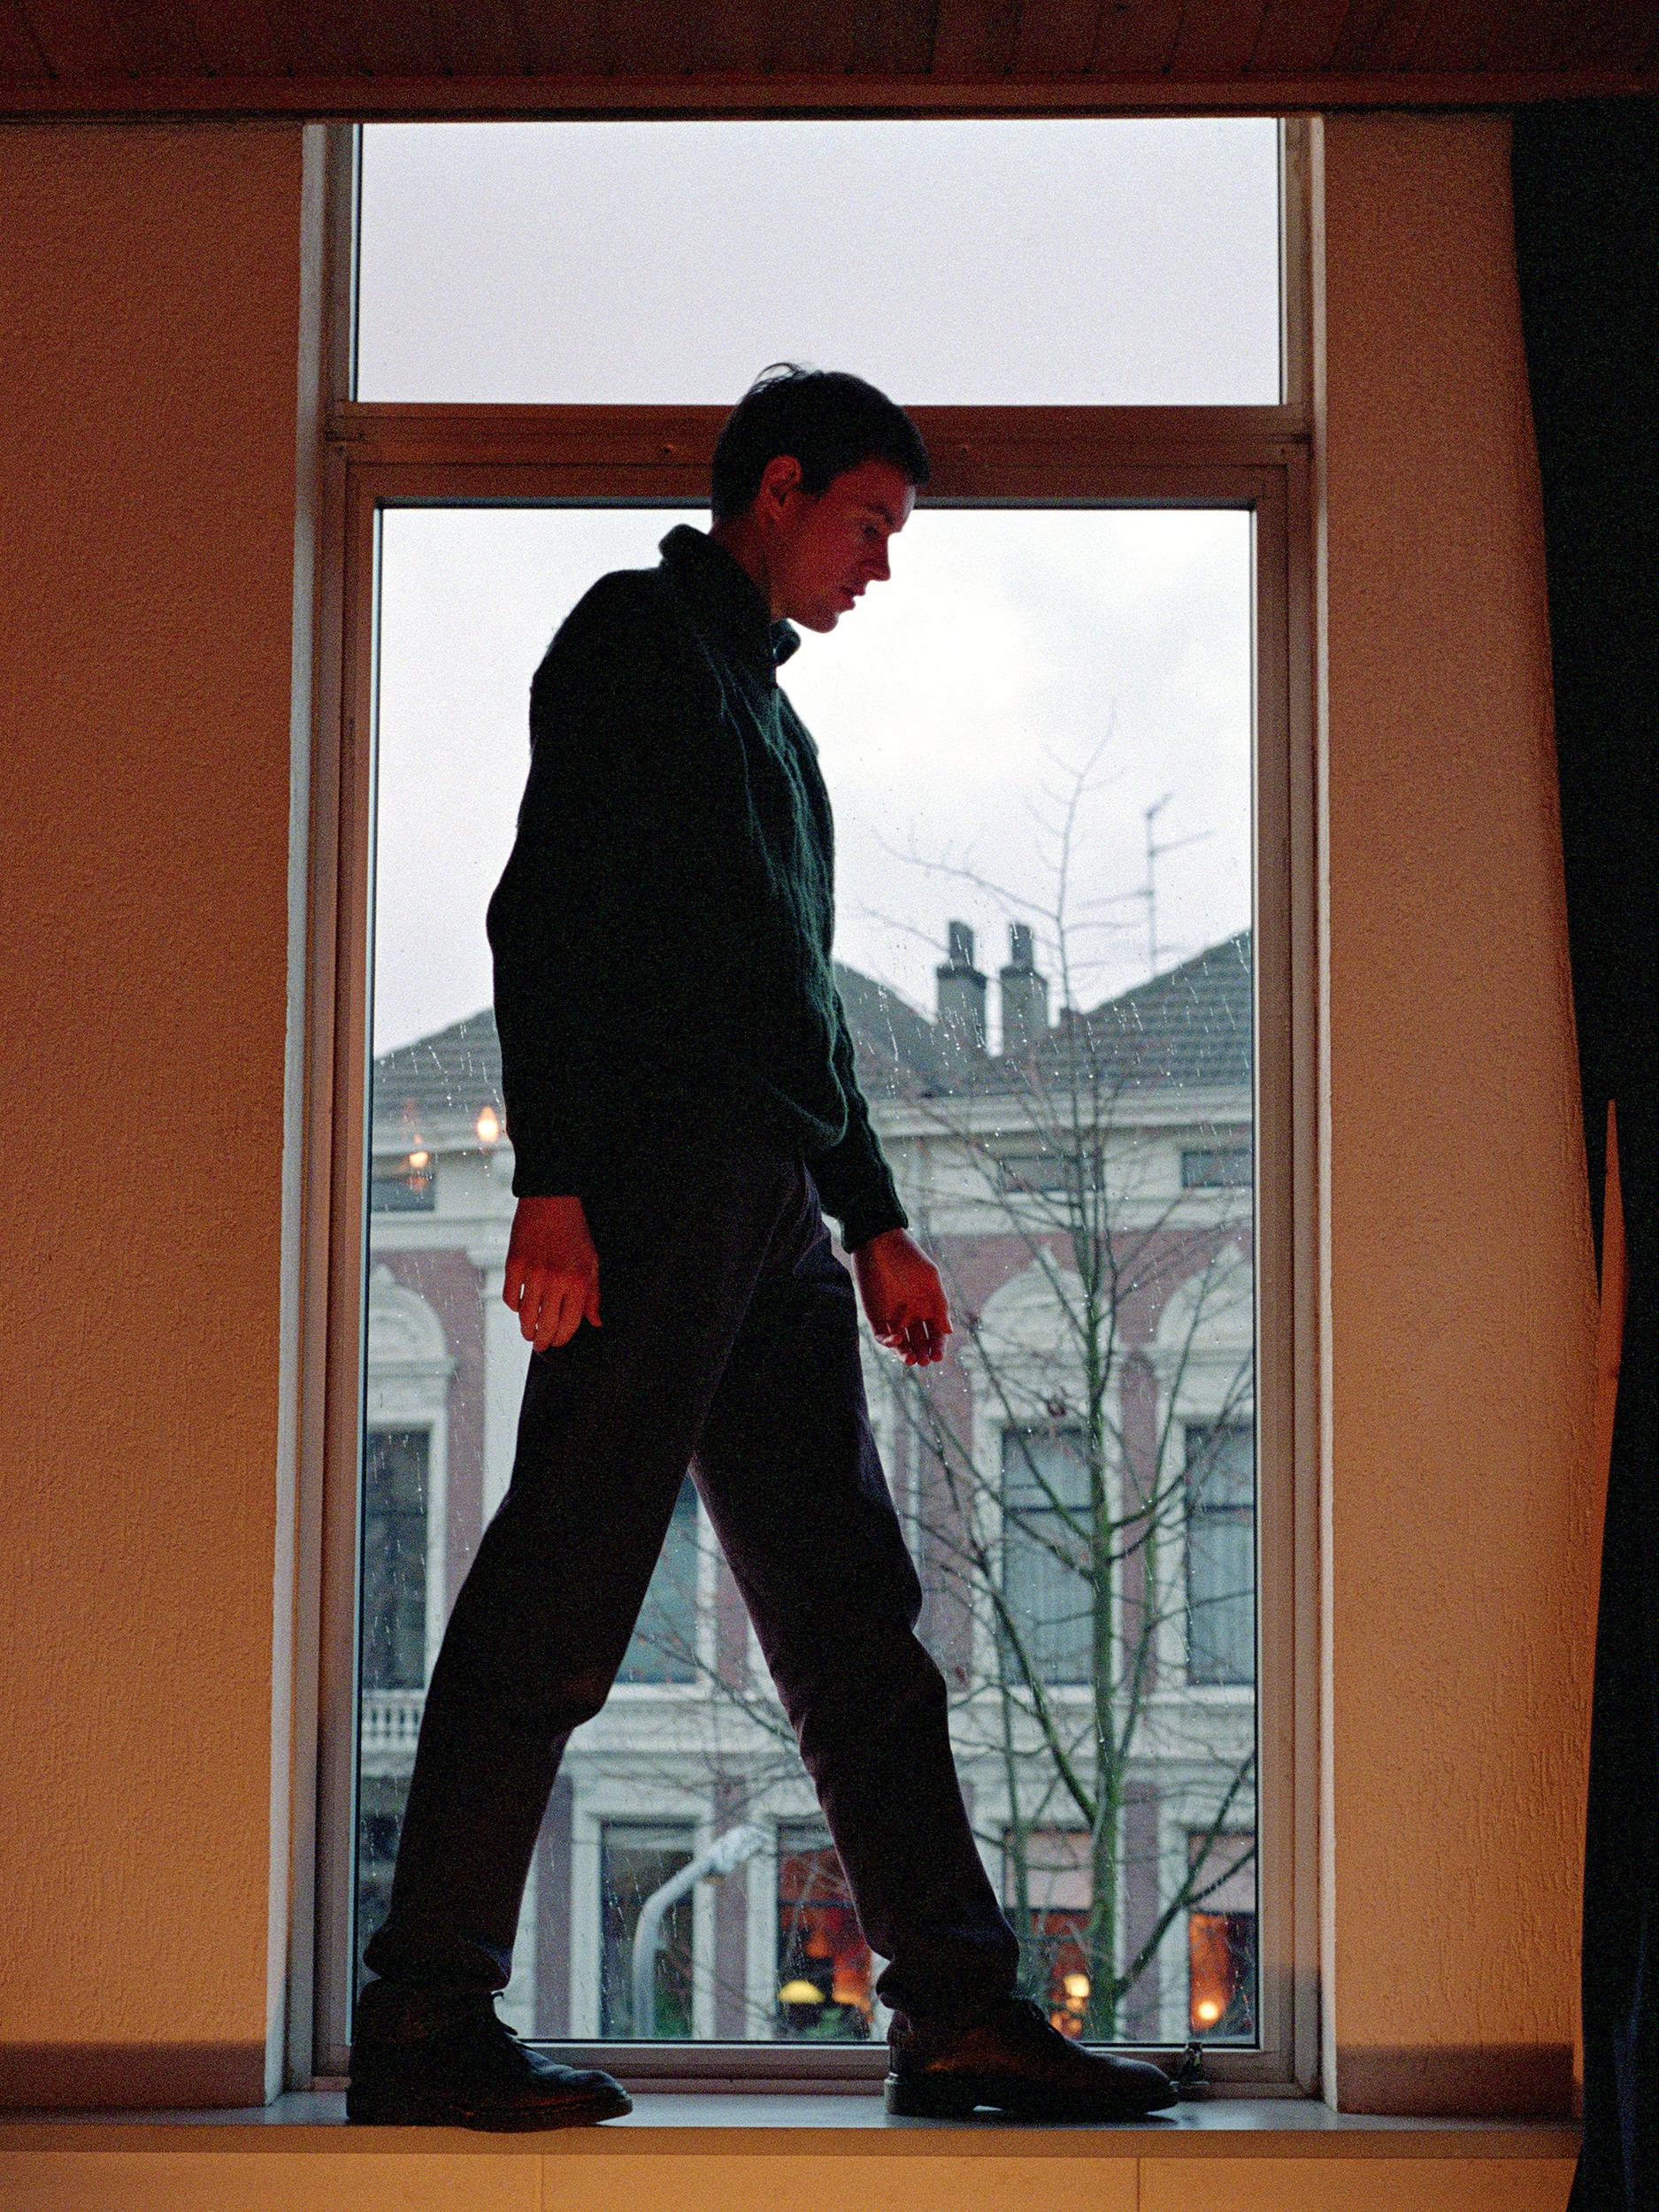 Self-portrait on Windowsill, photograph by Wouter van Riessen